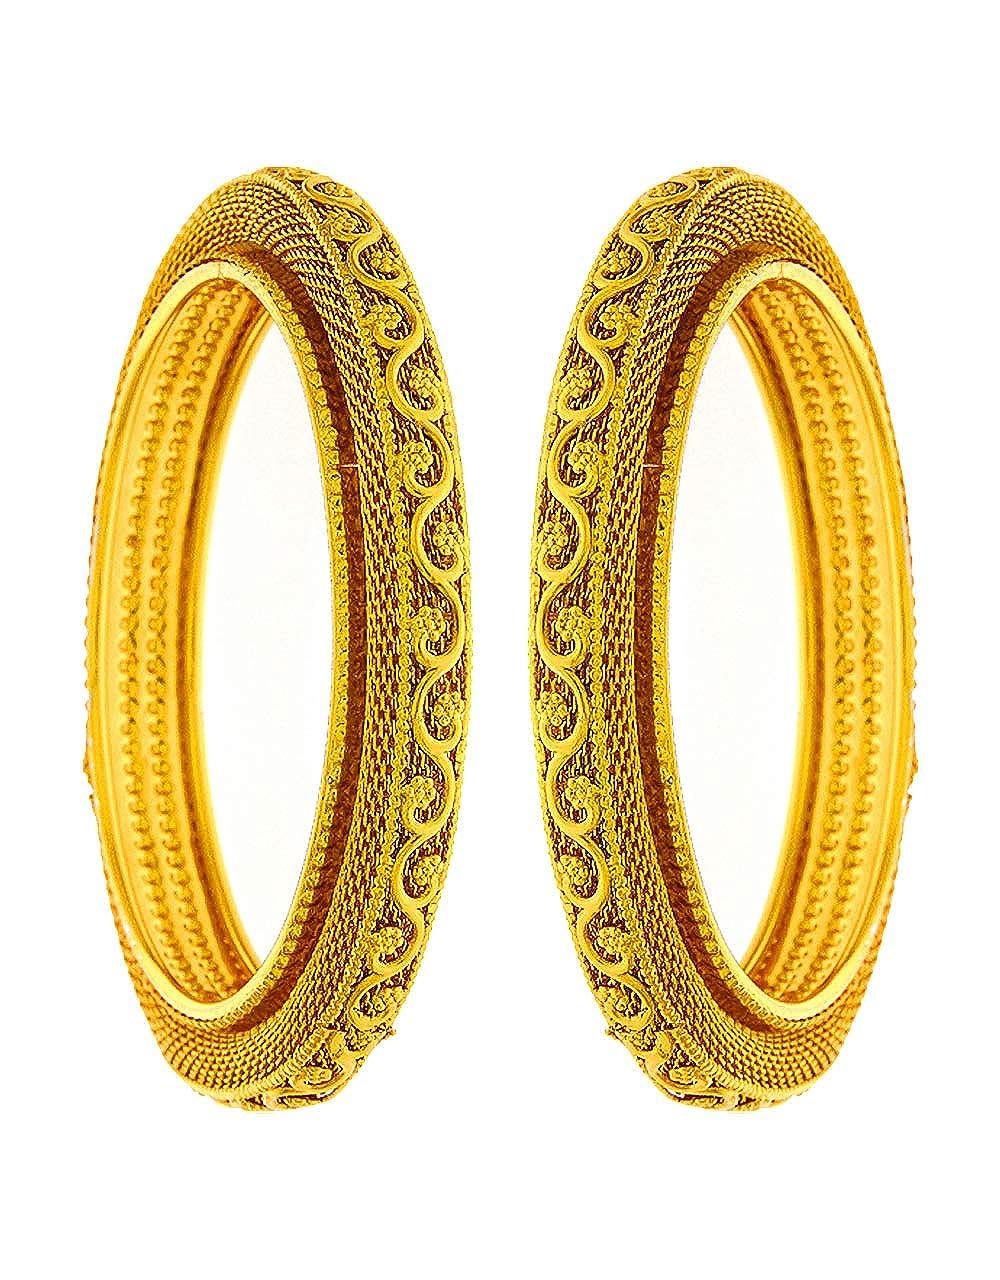 Anuradha Art Golden Colour Adorable Stylish Classy Traditional Bangles Set for Women//Girls